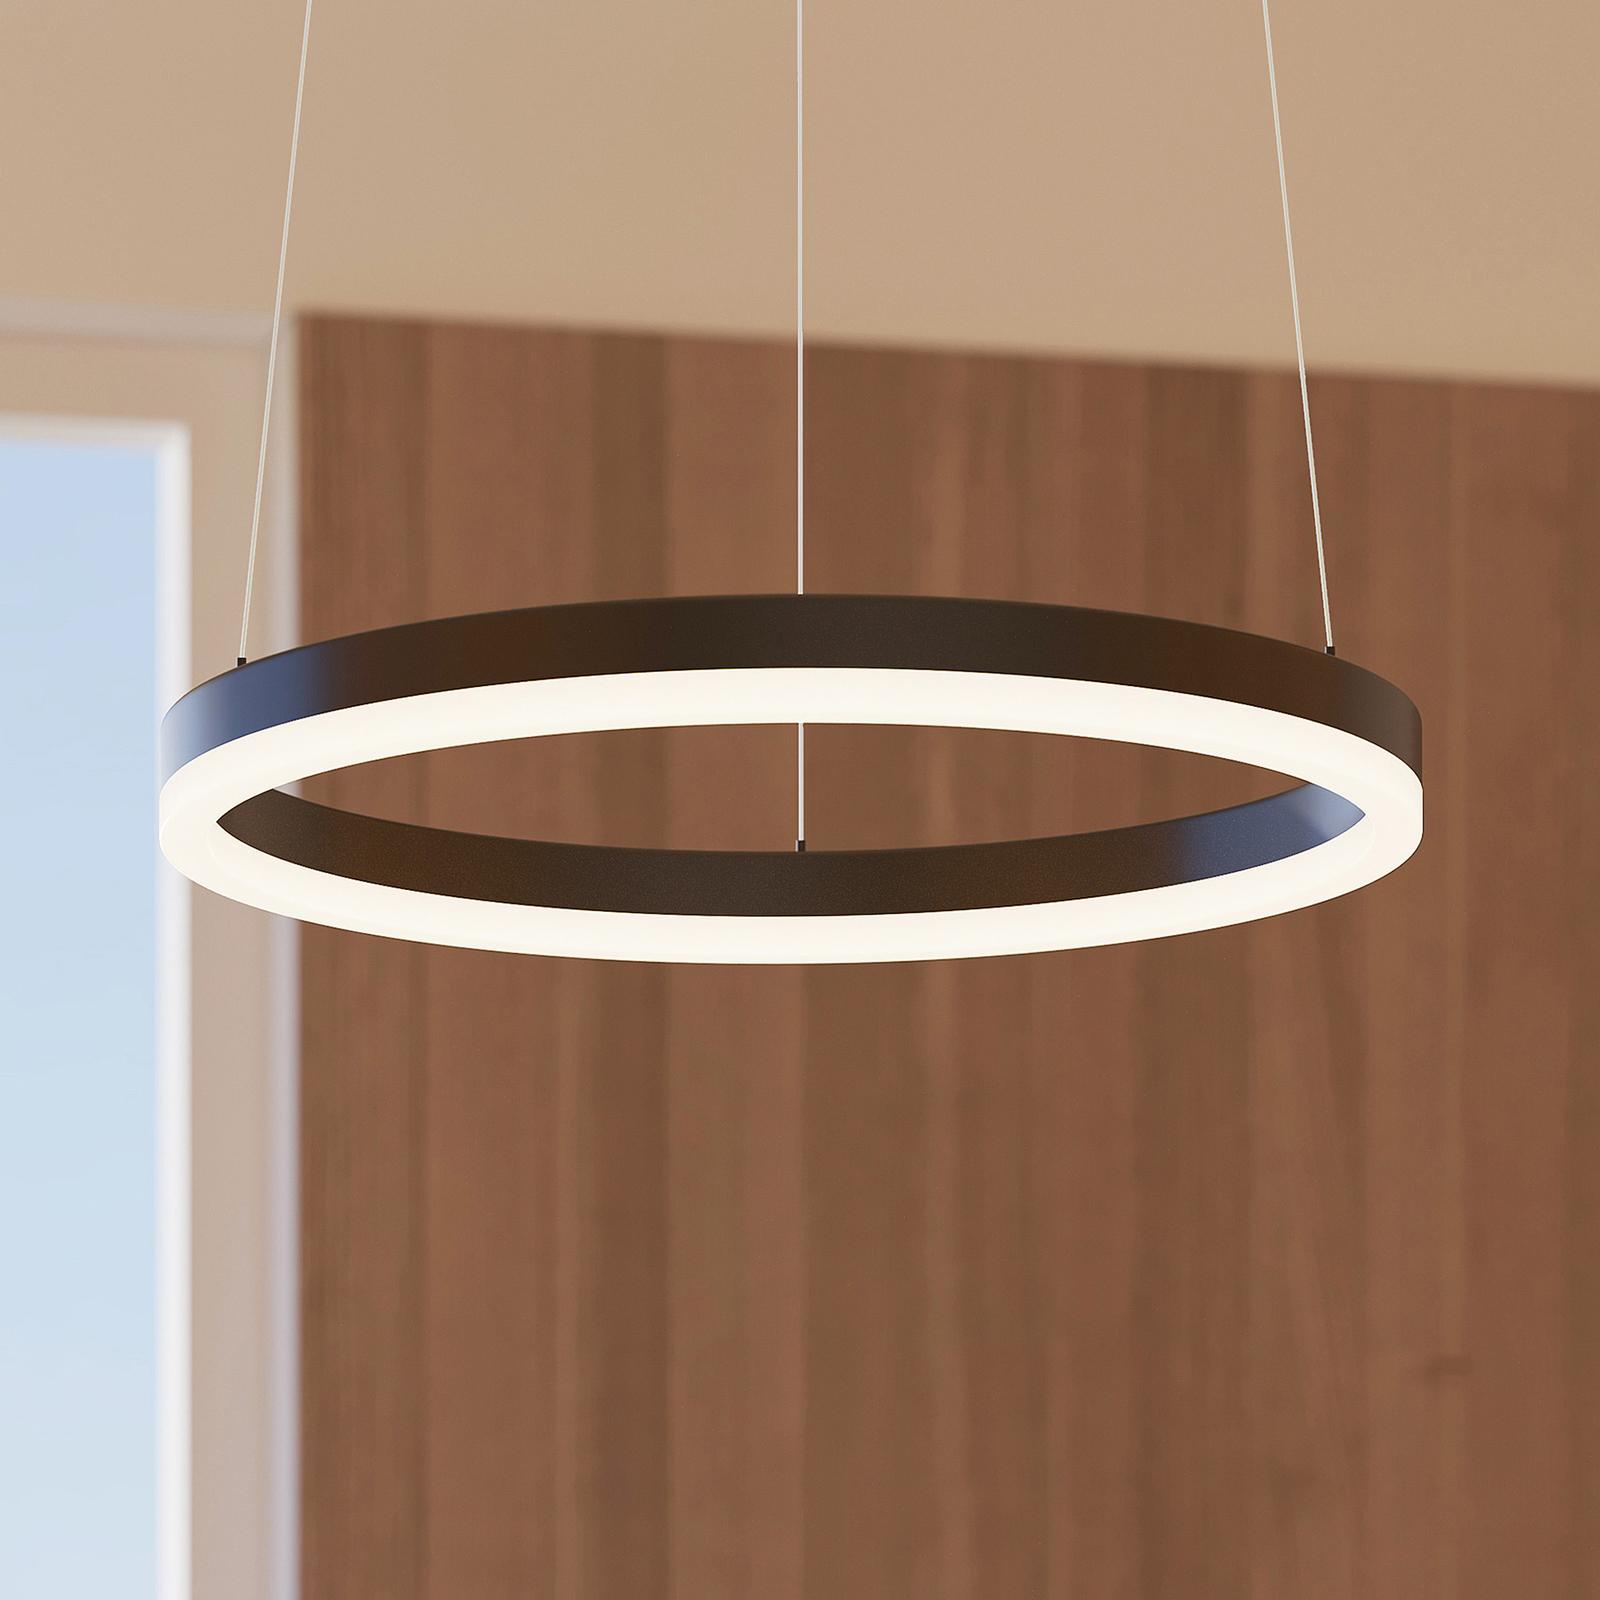 Arcchio Albiona LED-hengelampe, 1 ring, 40 cm